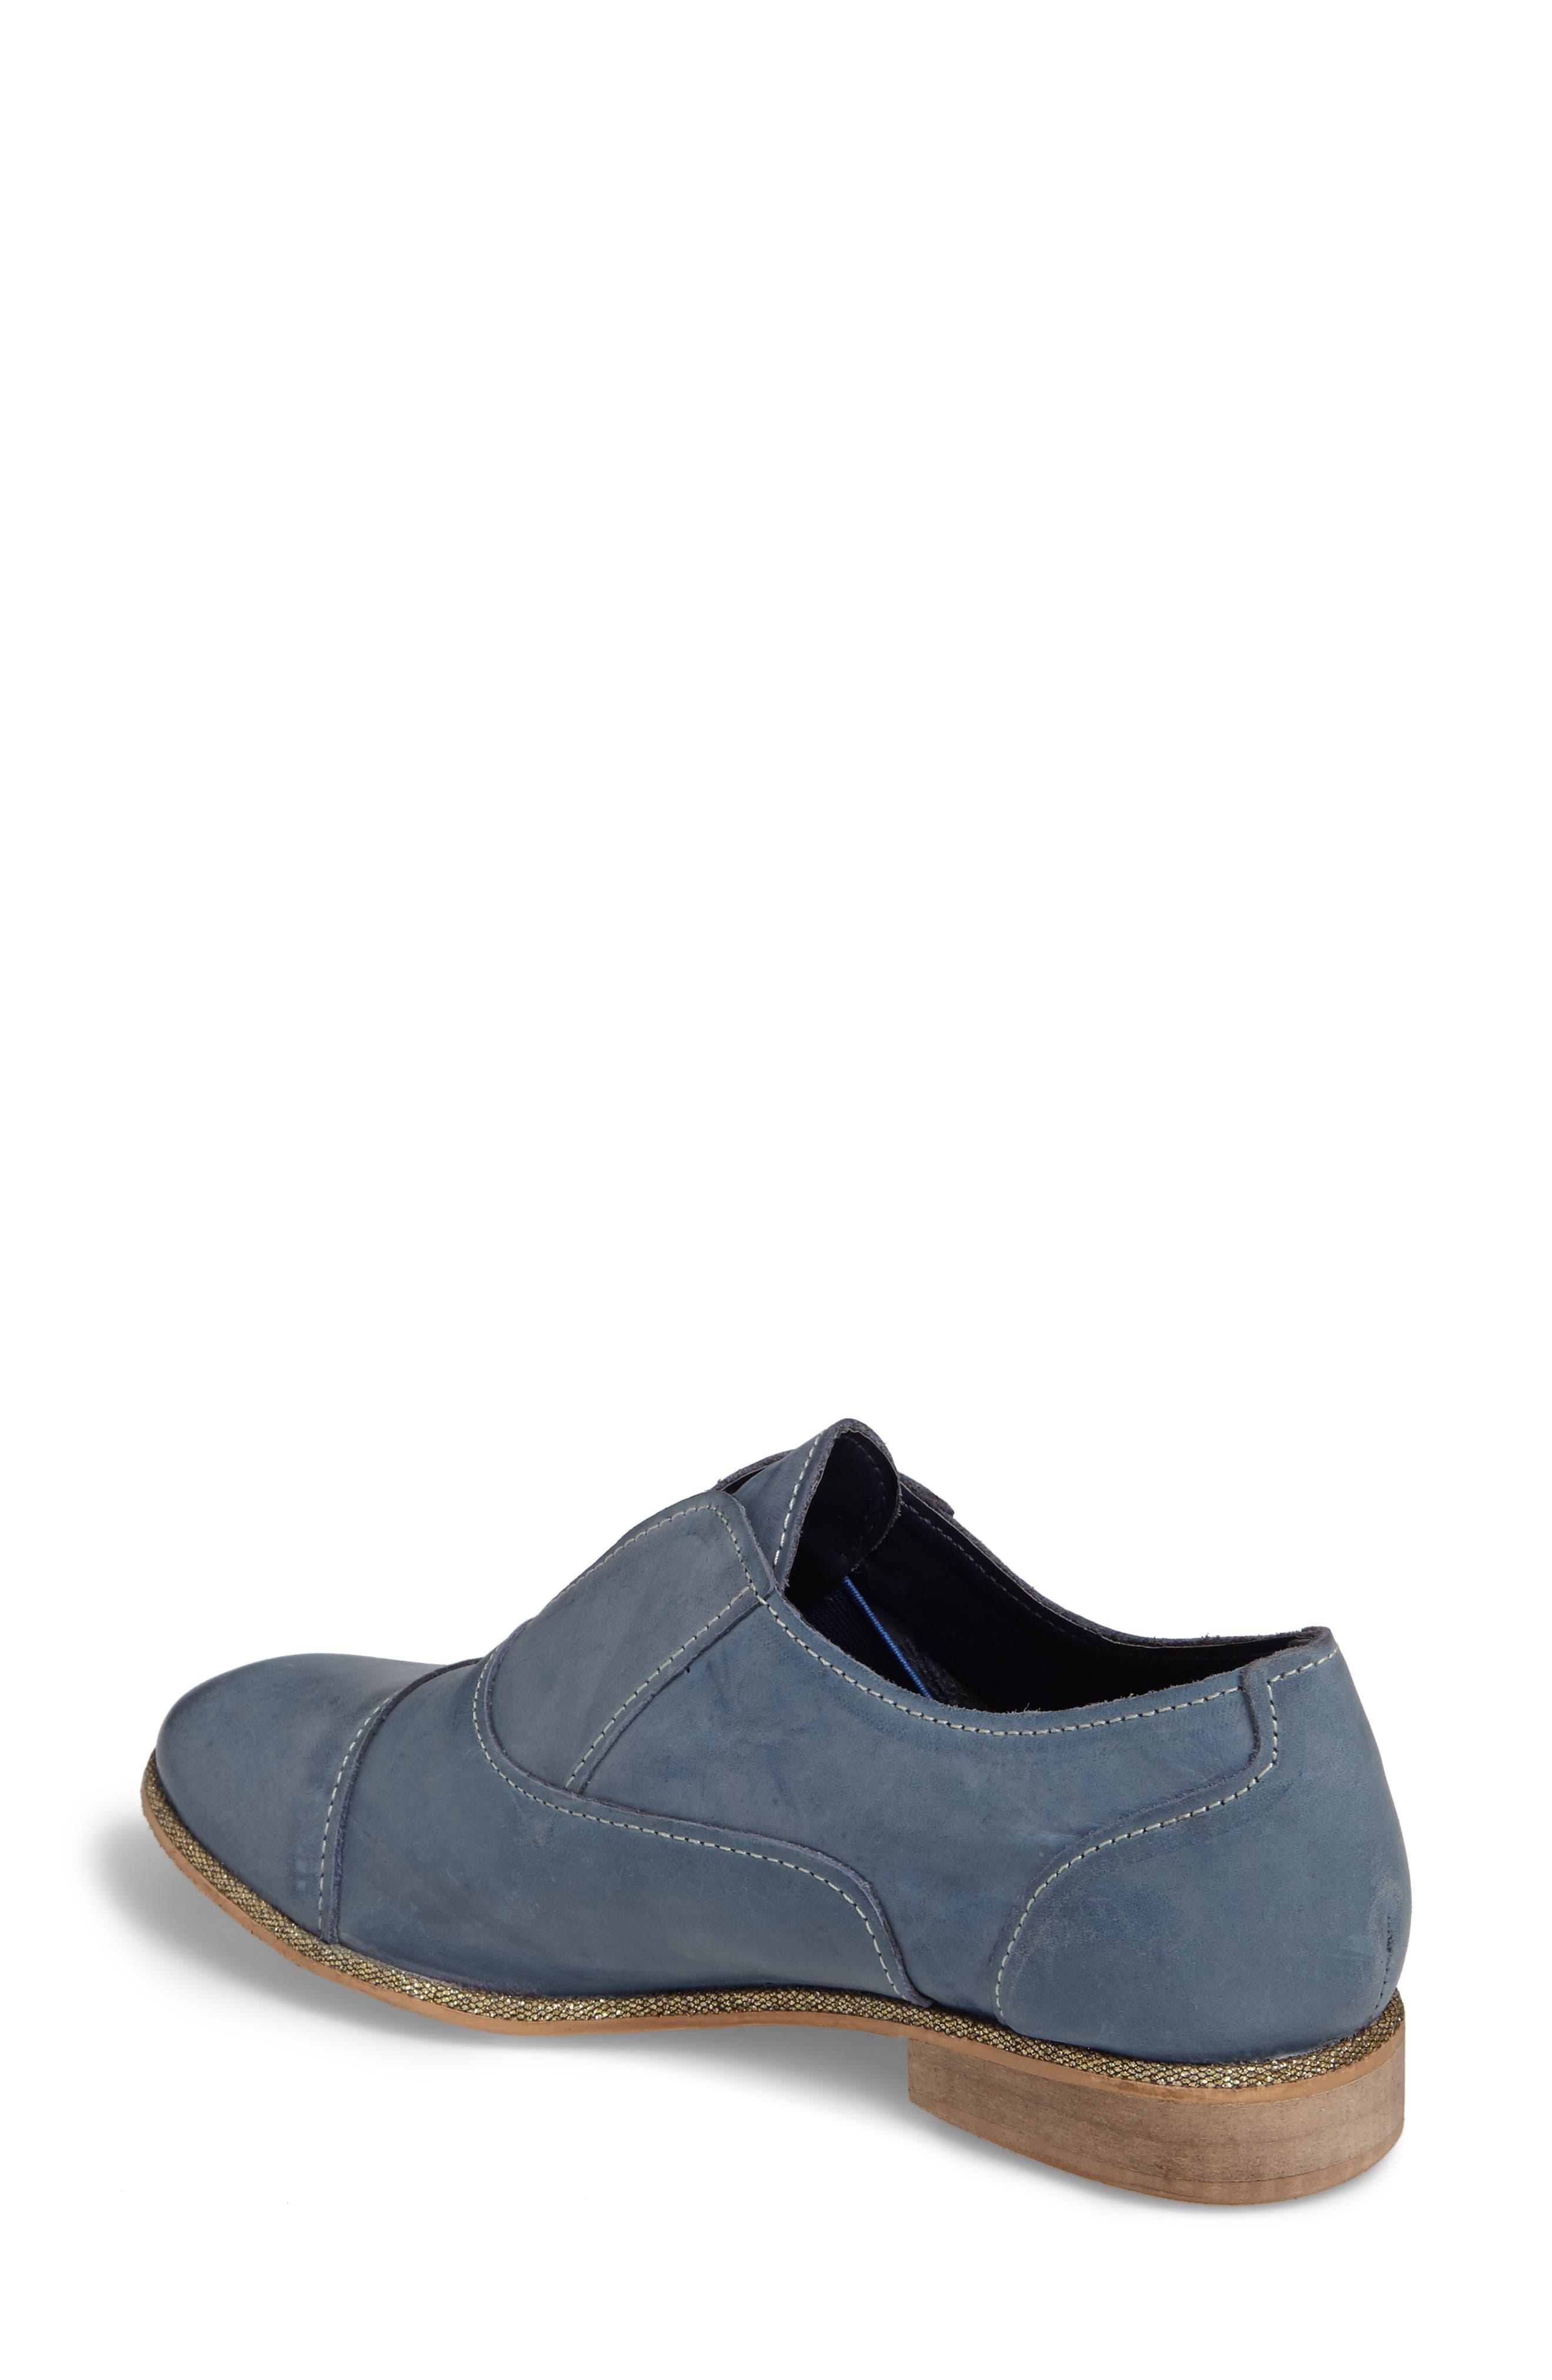 Slip Knot Loafer,                             Alternate thumbnail 2, color,                             Blue Leather